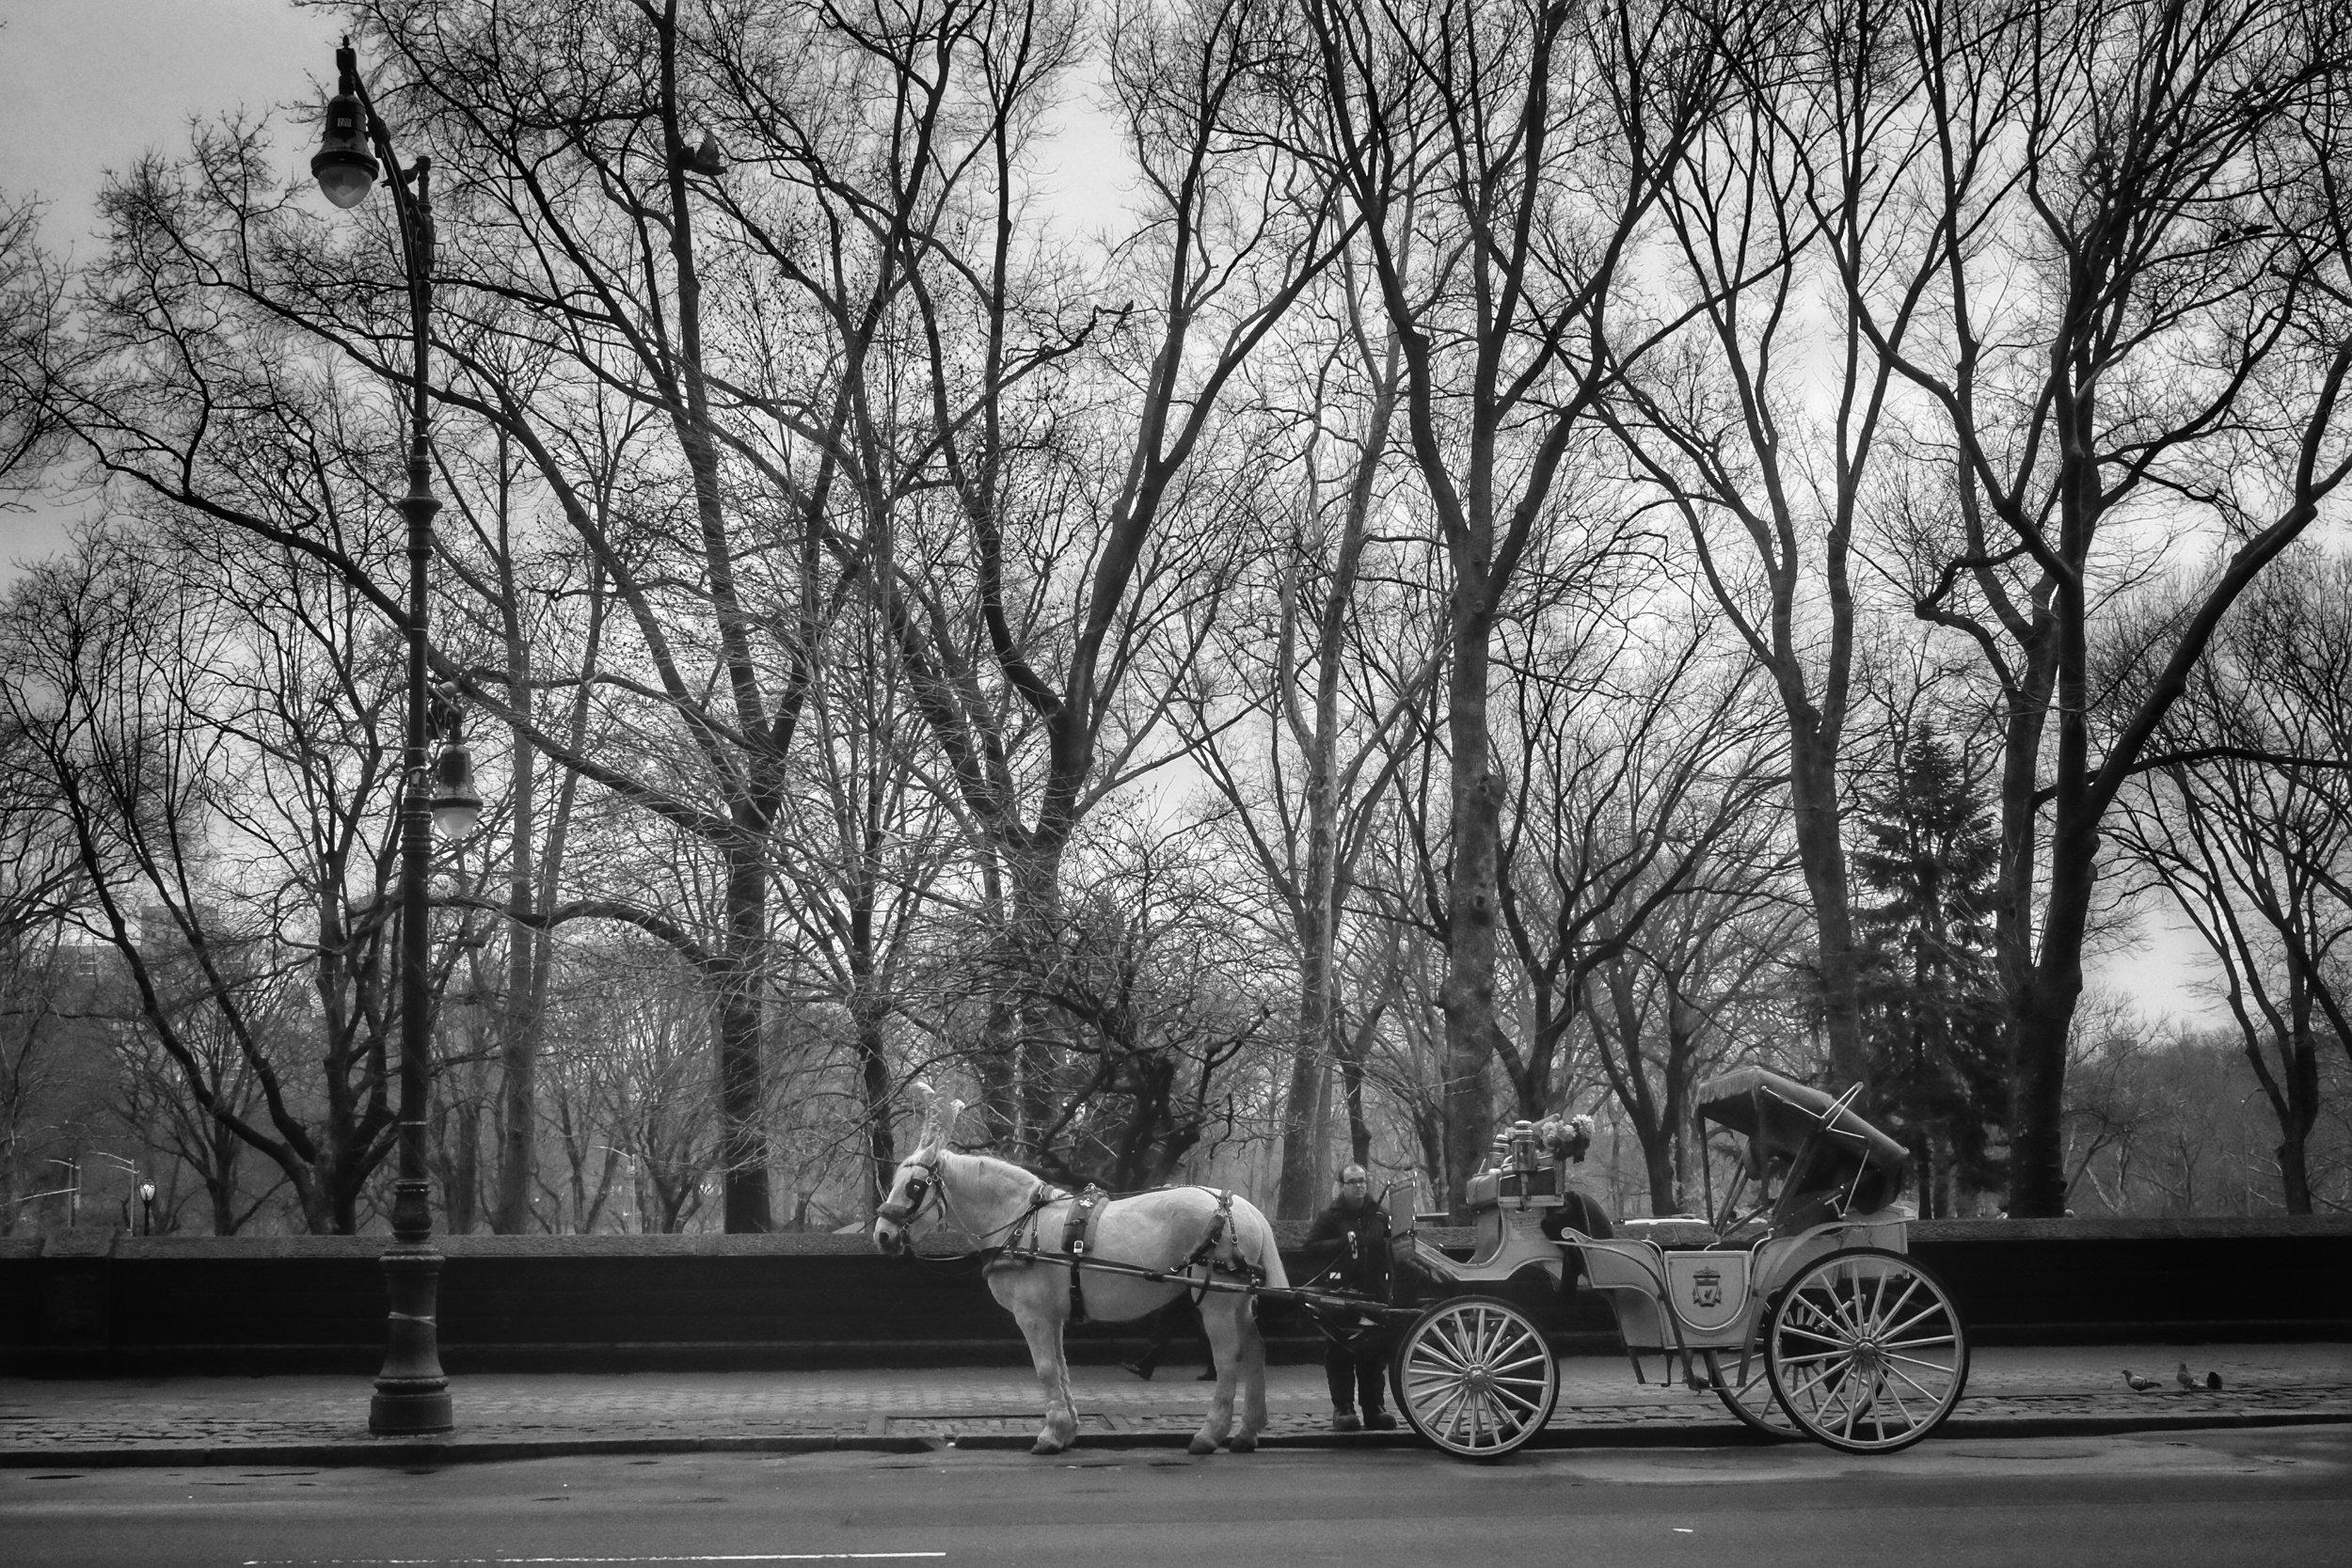 Central Park West. Columbus Circle. New York City. 2017.